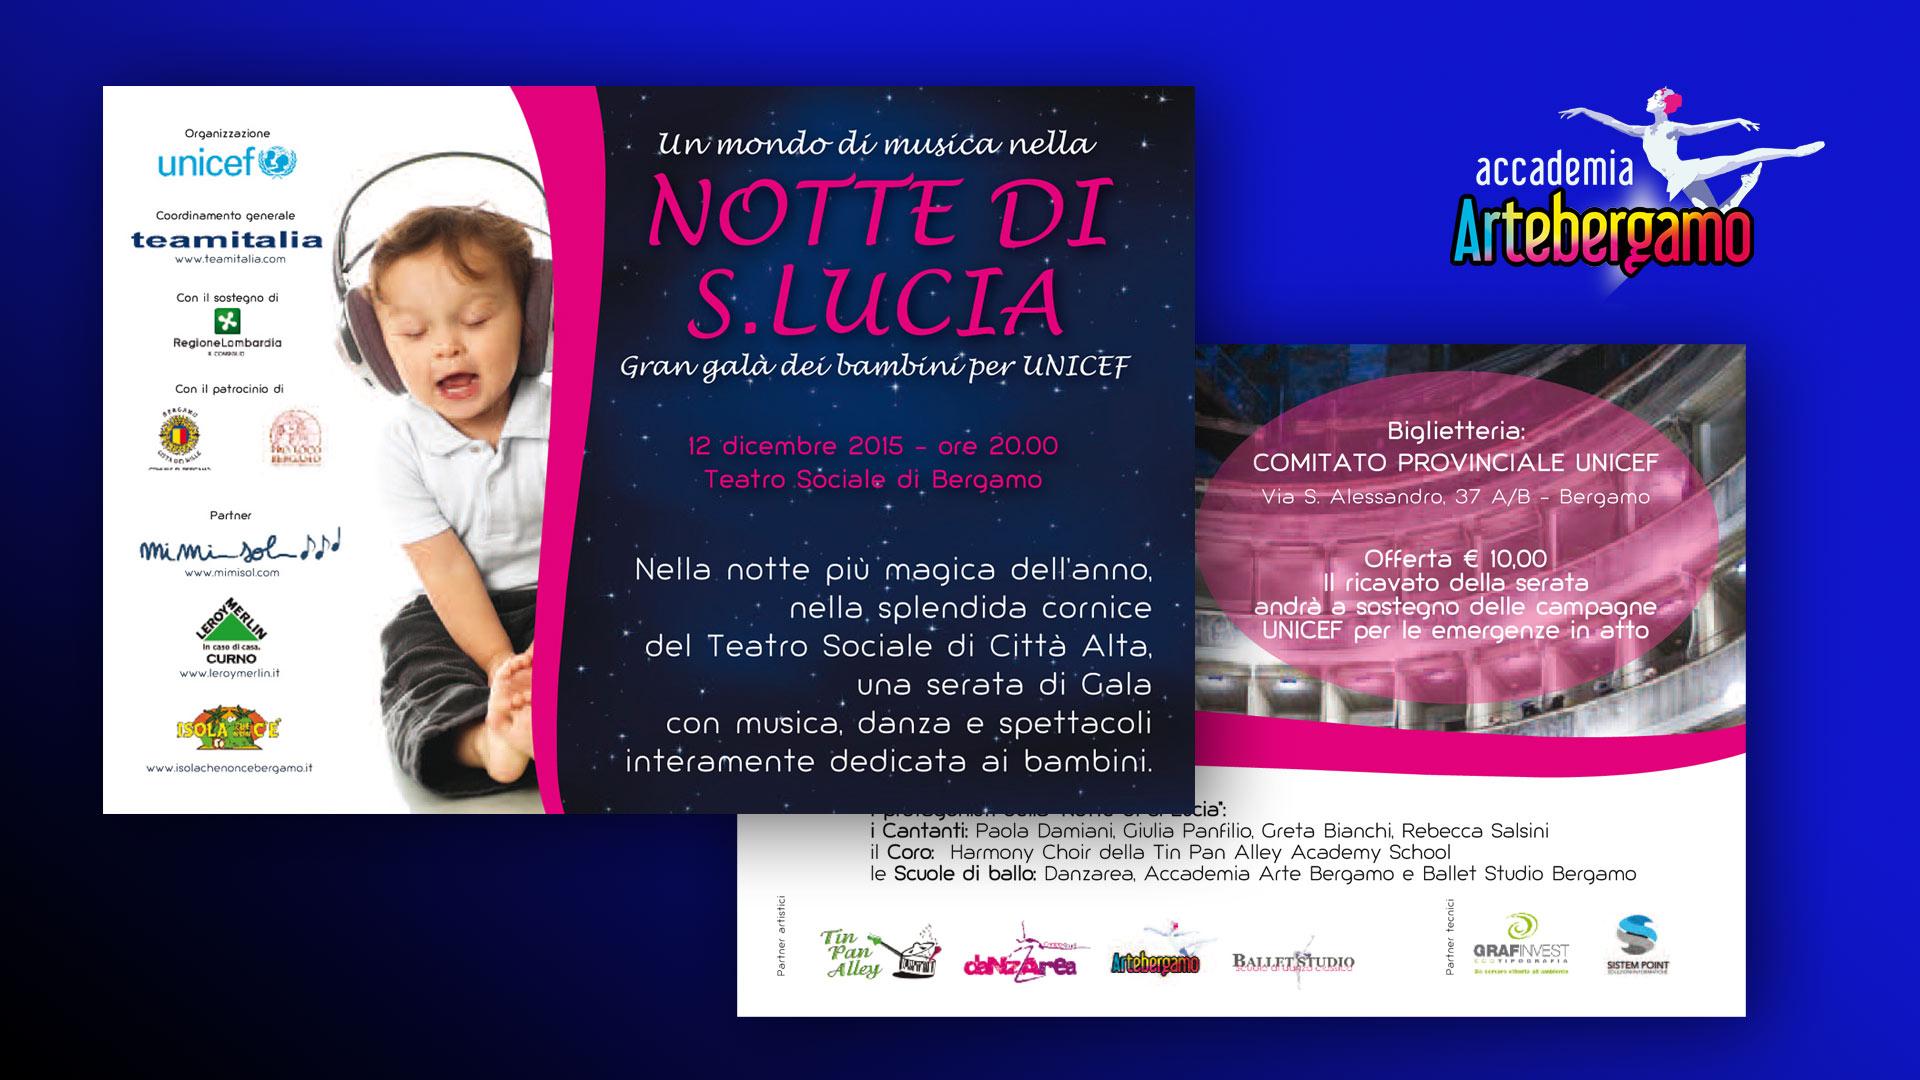 Accademia Arte Bergamo - Santa Lucia 2015